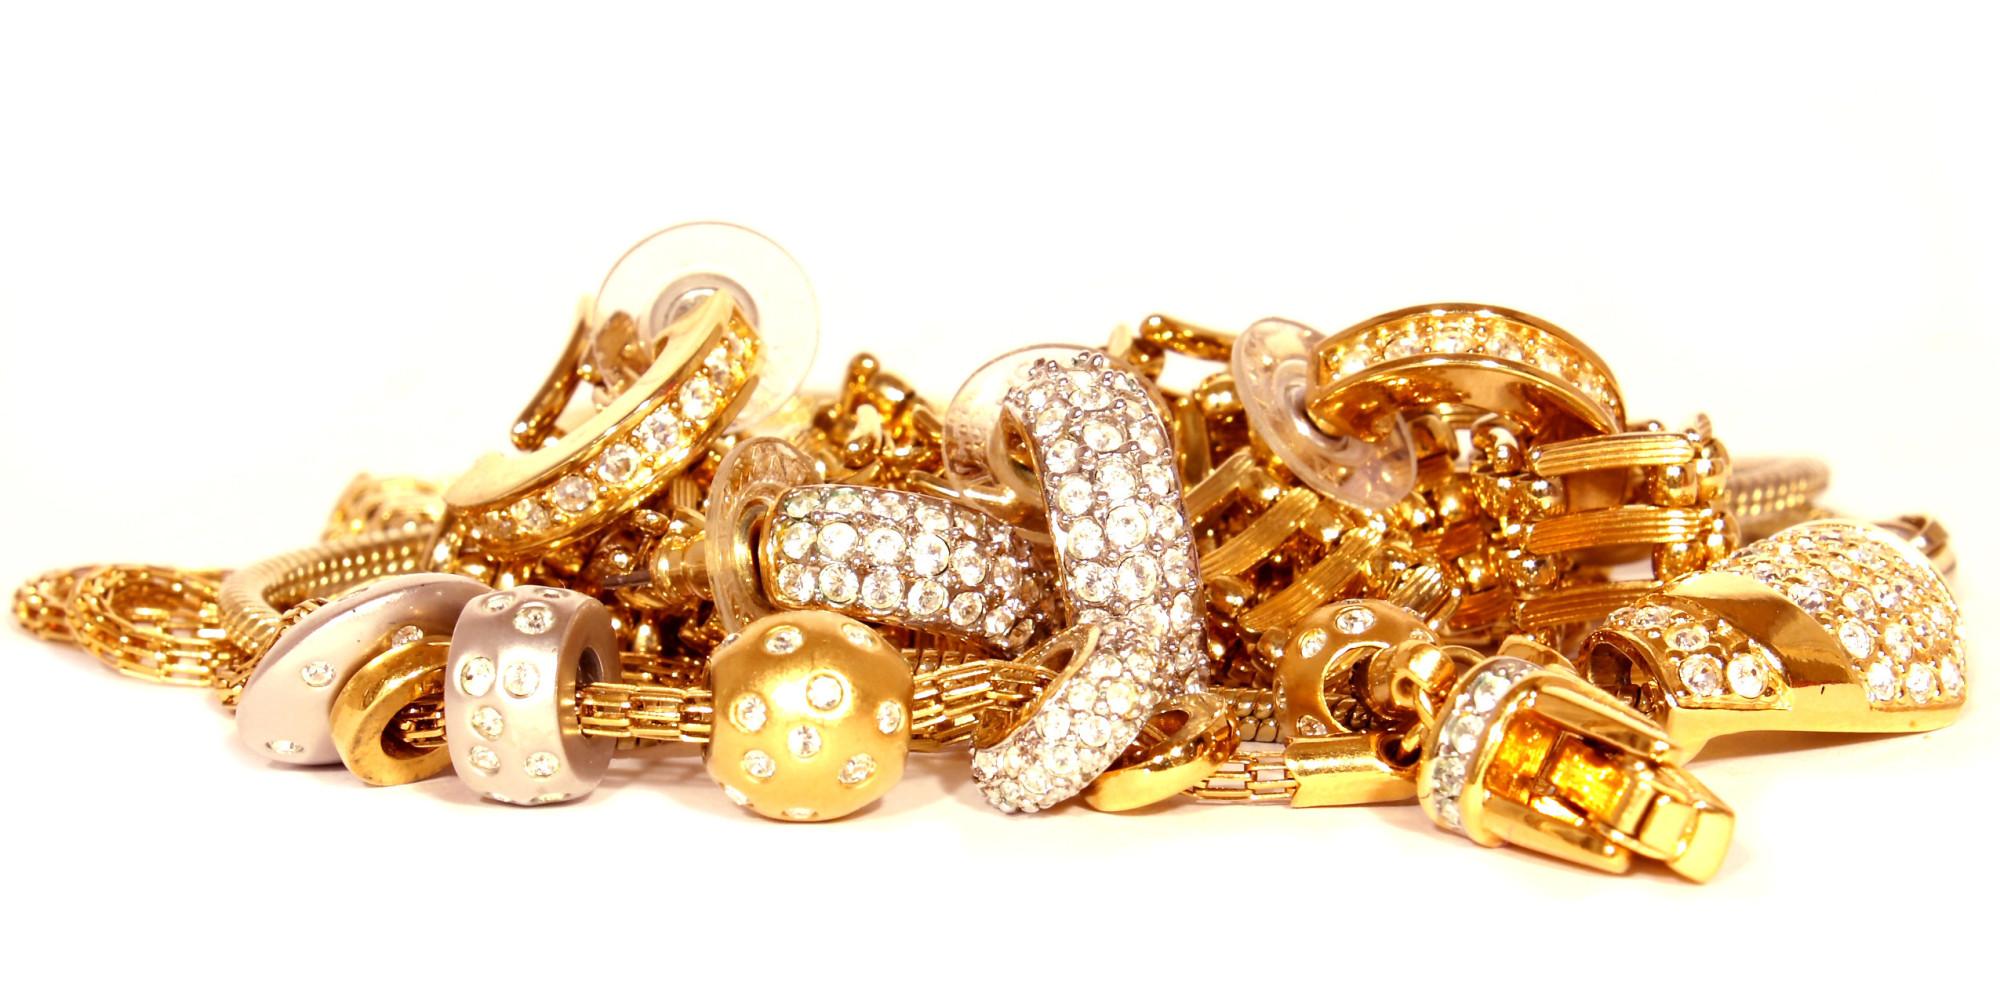 4239784-jewelry